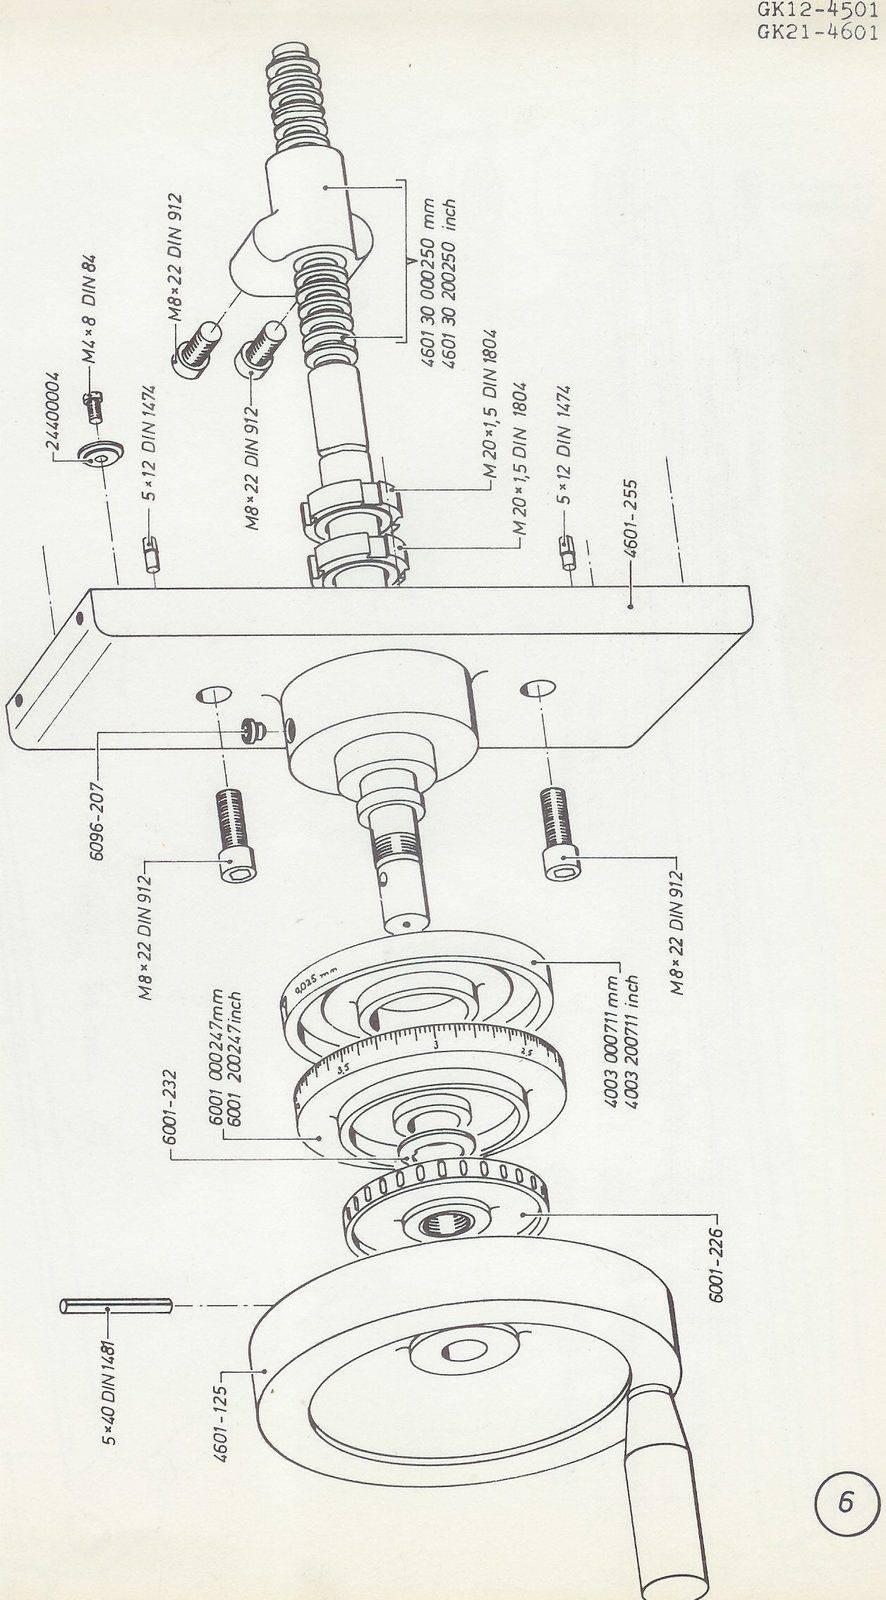 Deckel GK12-21 Parts Catalogue 1975 p6.jpg